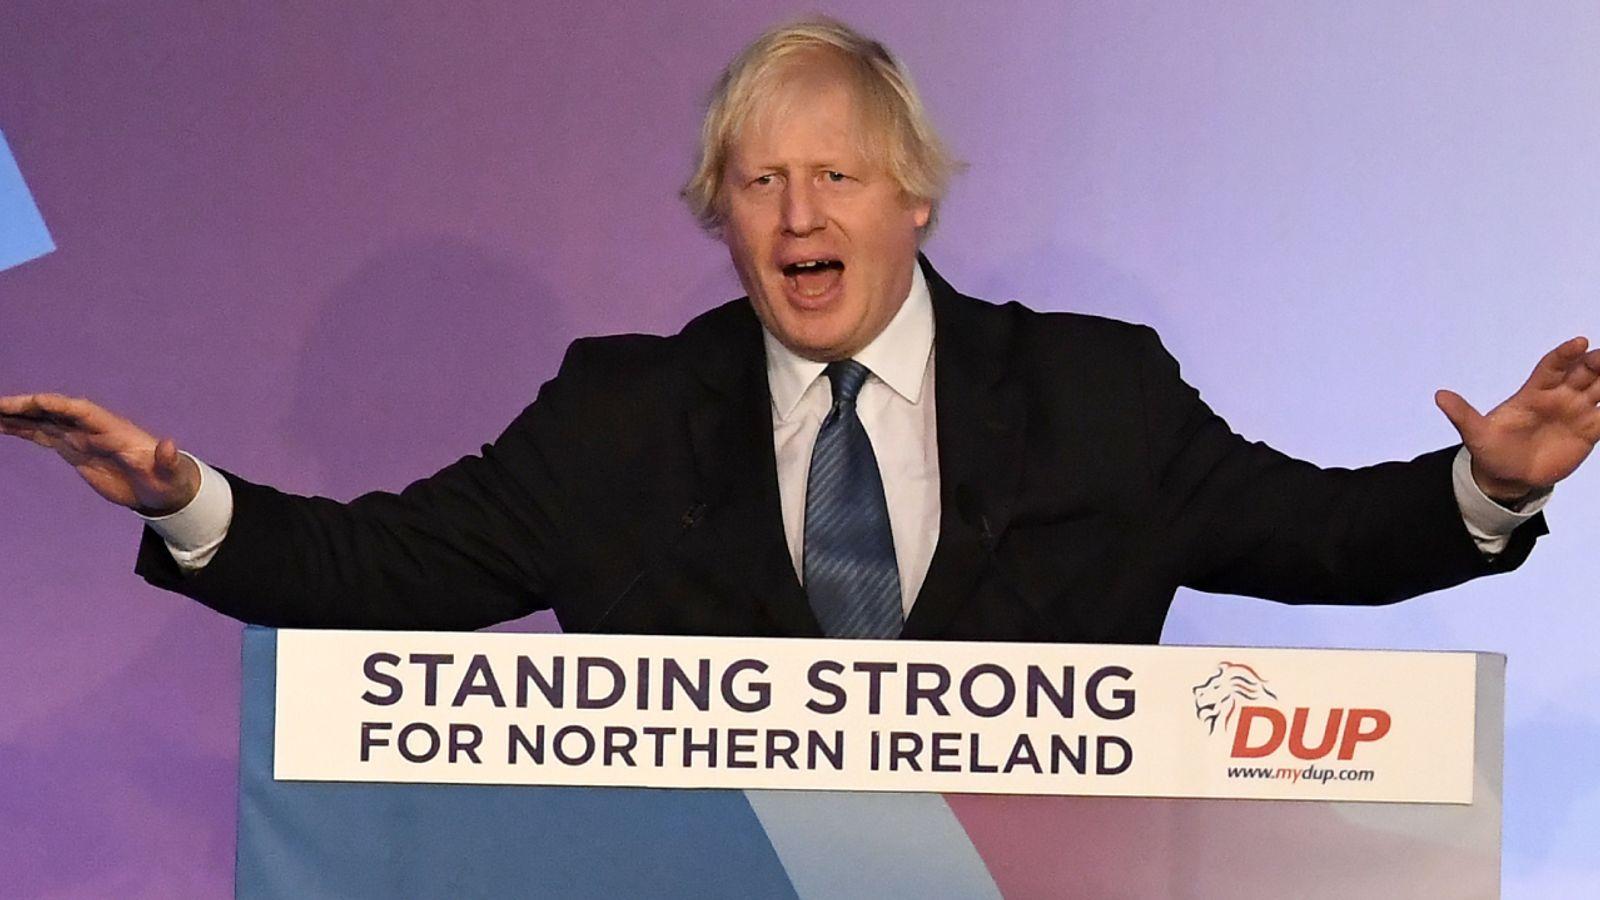 Northern Ireland: Broken Brexit promises threaten to turn back the clock on fragile peace